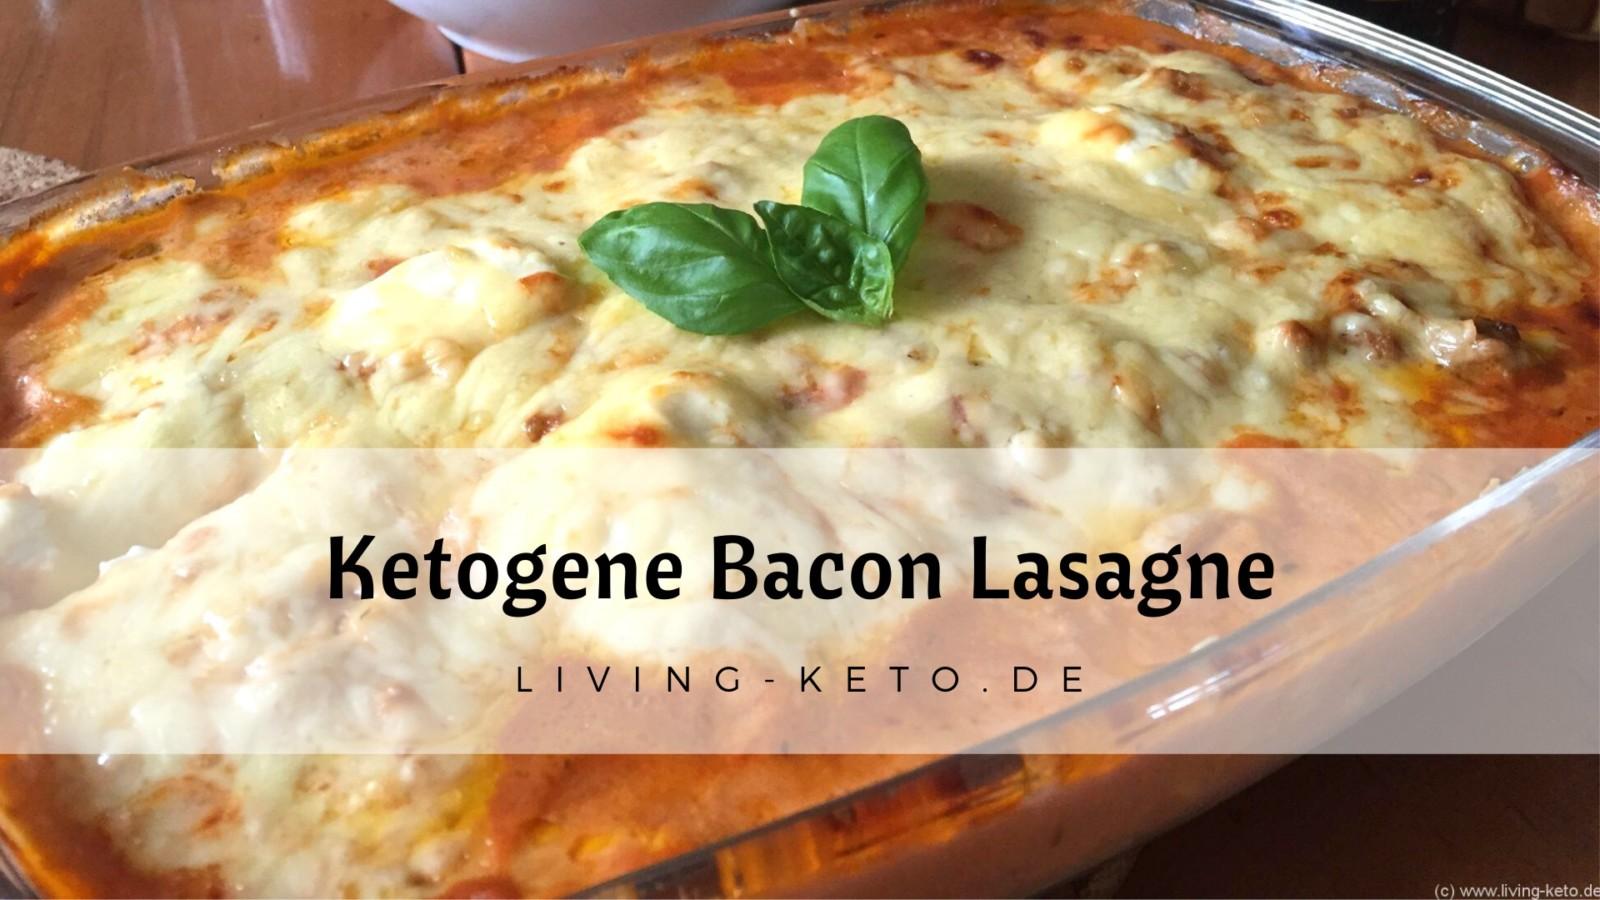 Ketogene Bacon Lasagne